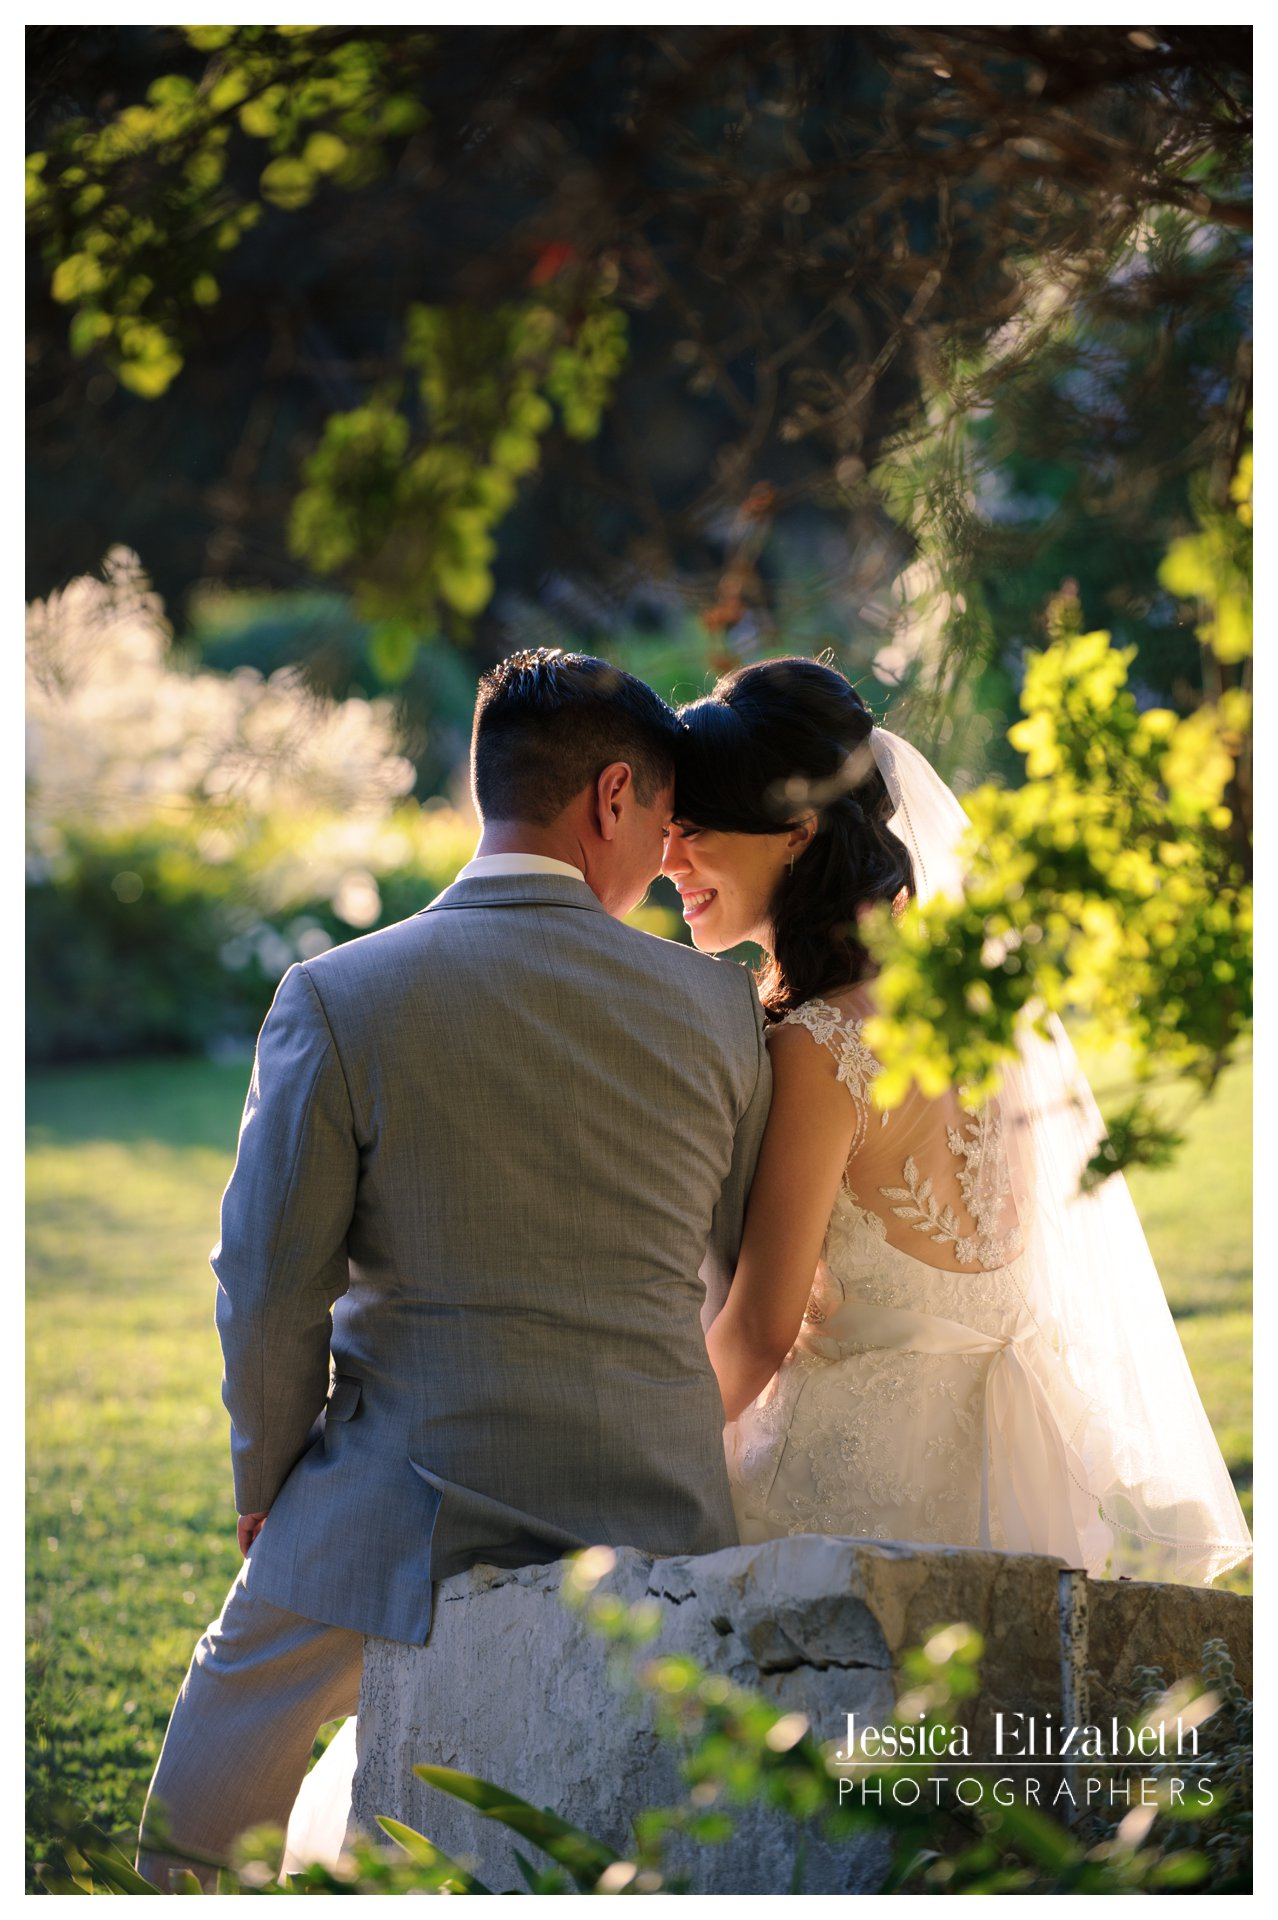 28-South Coast Botanic Garden Palos Verdes Wedding Photography by Jessica Elizabeth